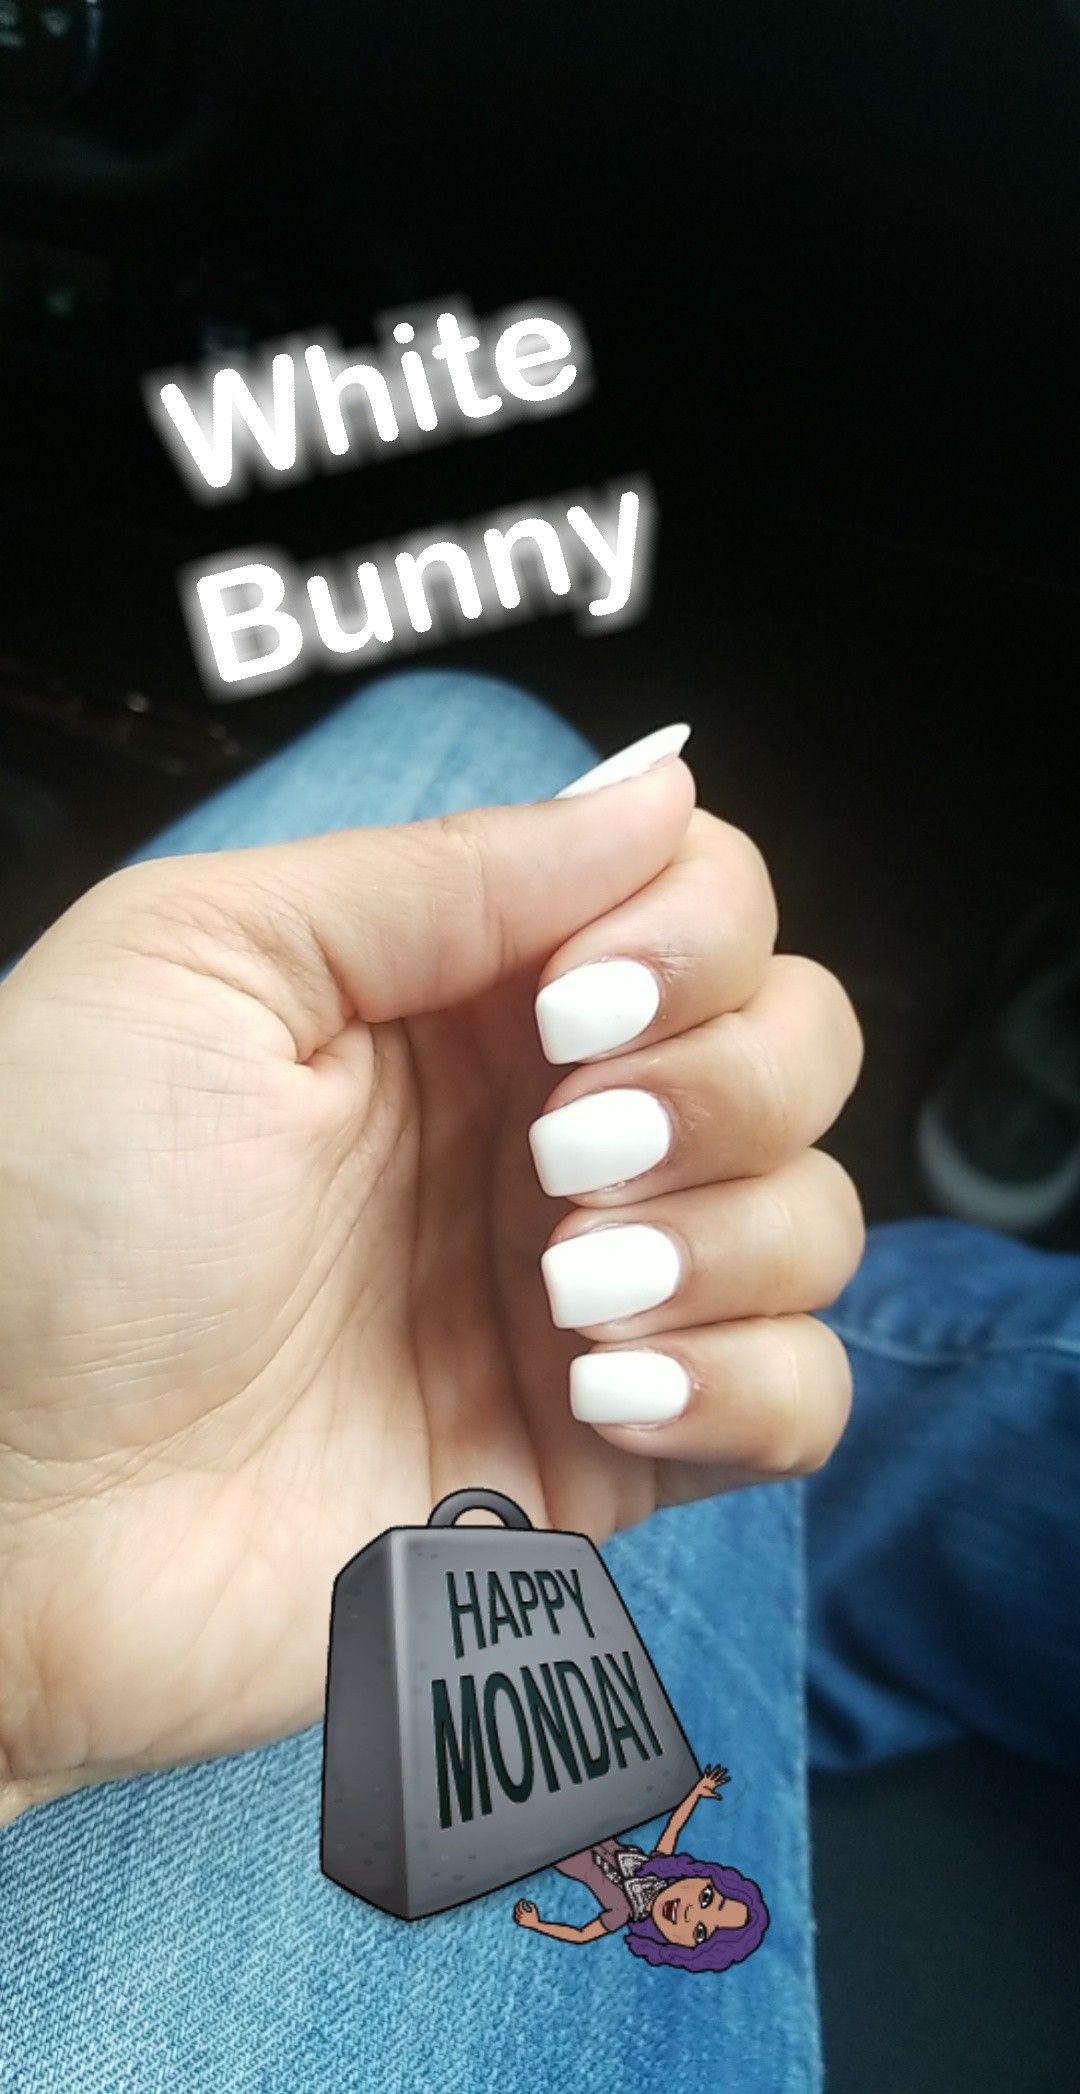 Dnd Gel White Bunny Naturalnails Dip Nail Colors Glitter Gel Nails